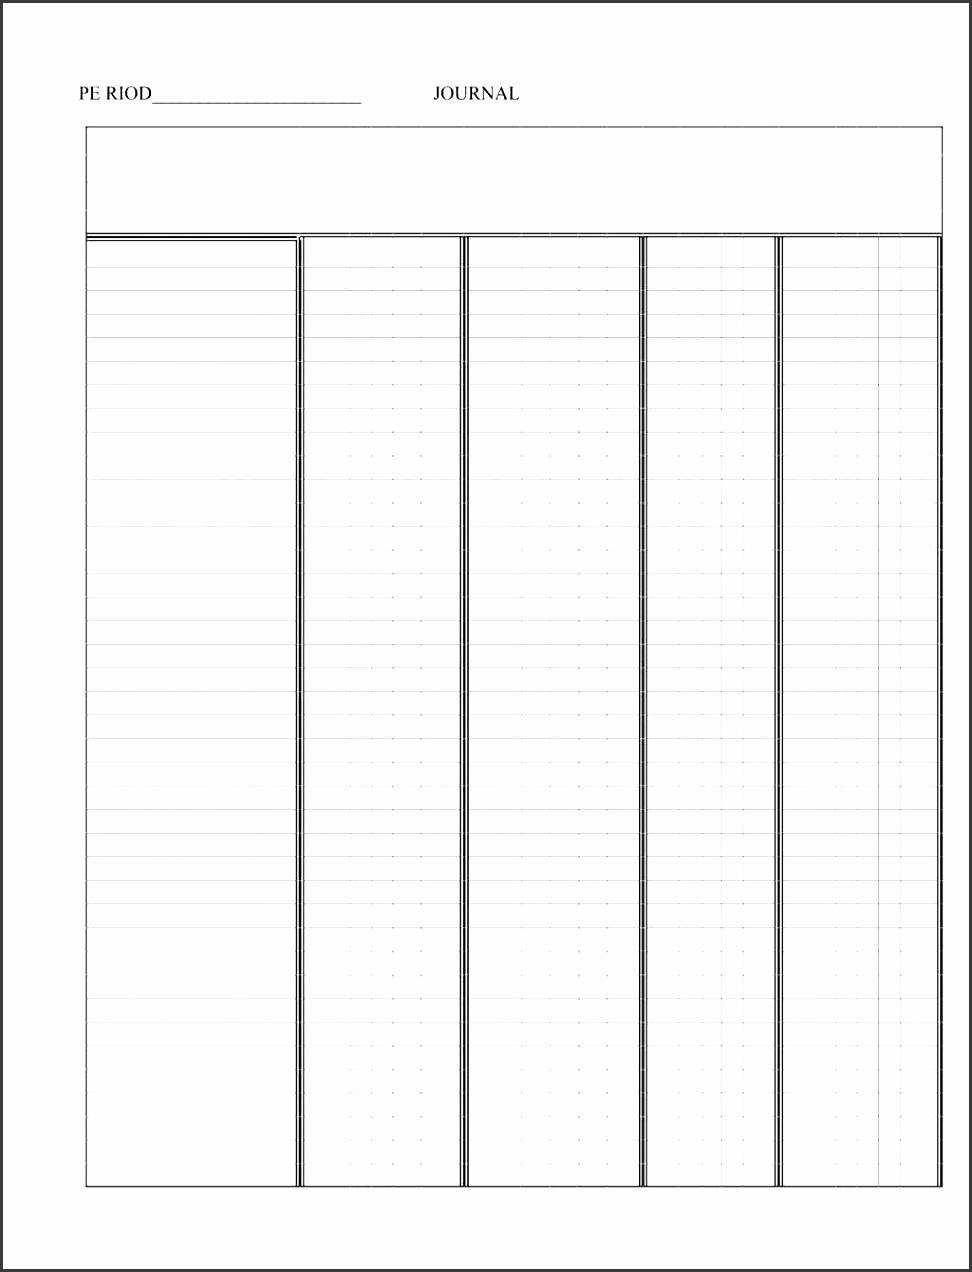 general ledger template pdf